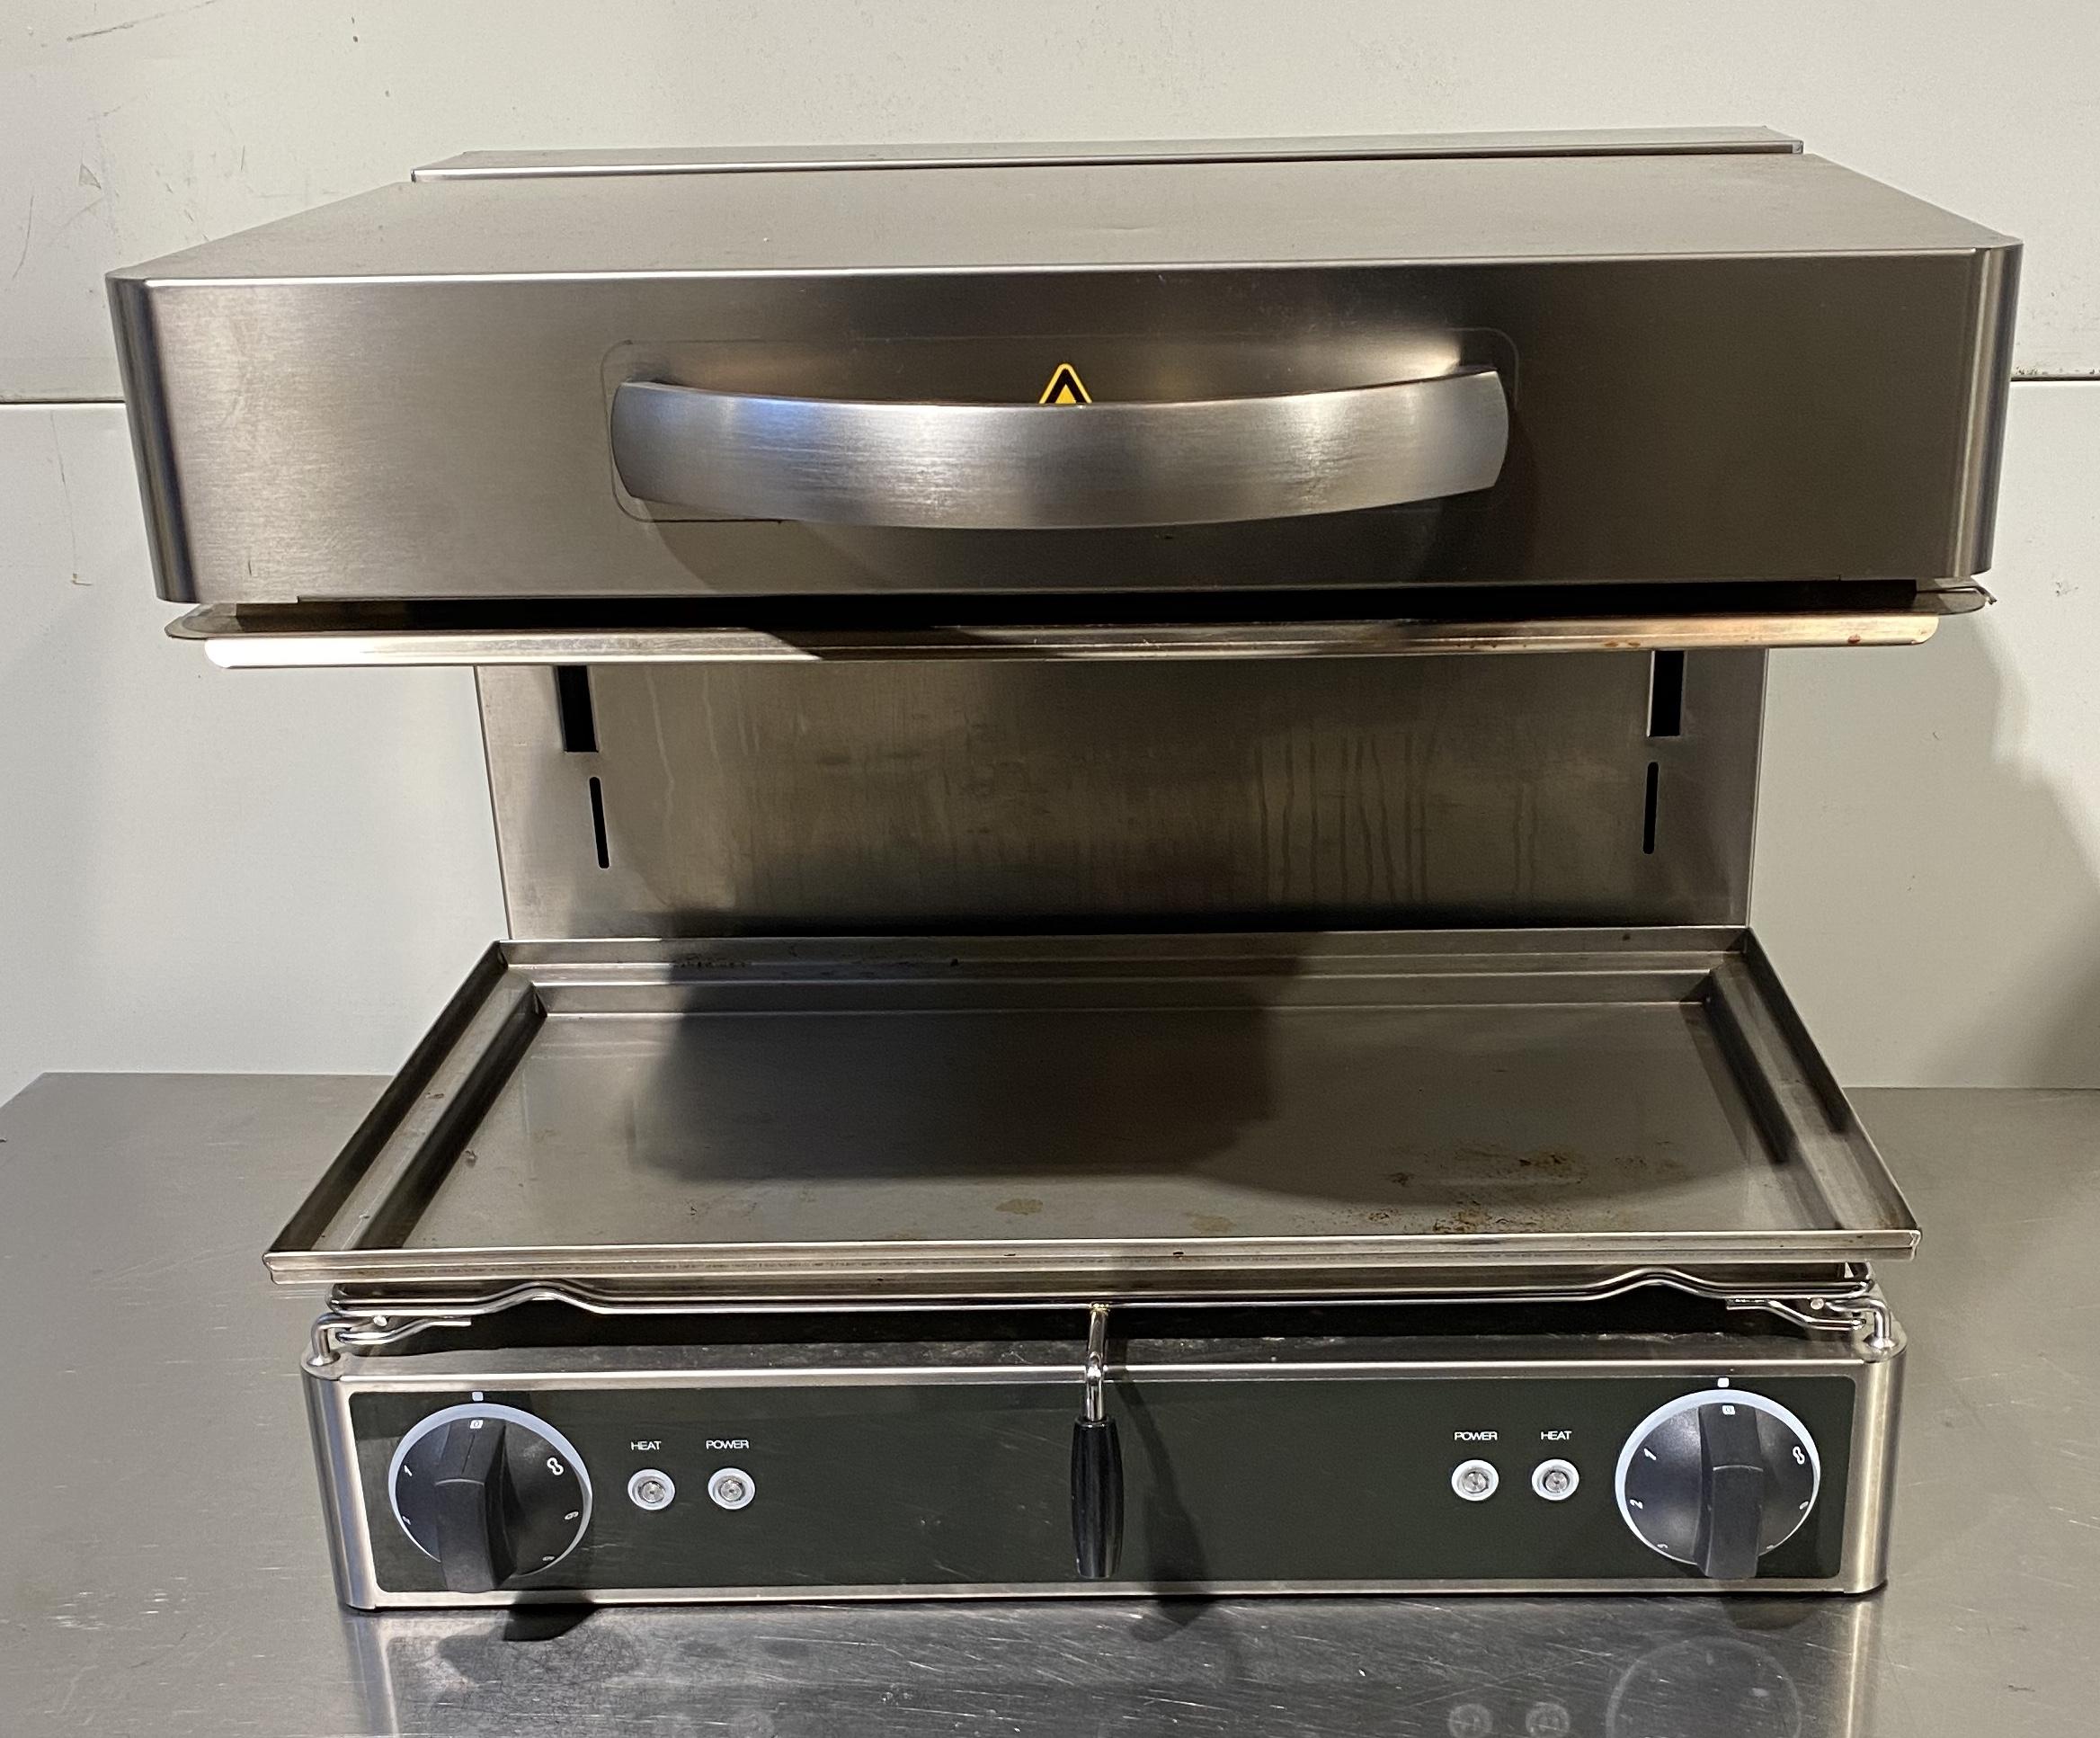 TEKNONOX SE60 Electric Riser Salamander Grill – 3 Phase – Clearance Item